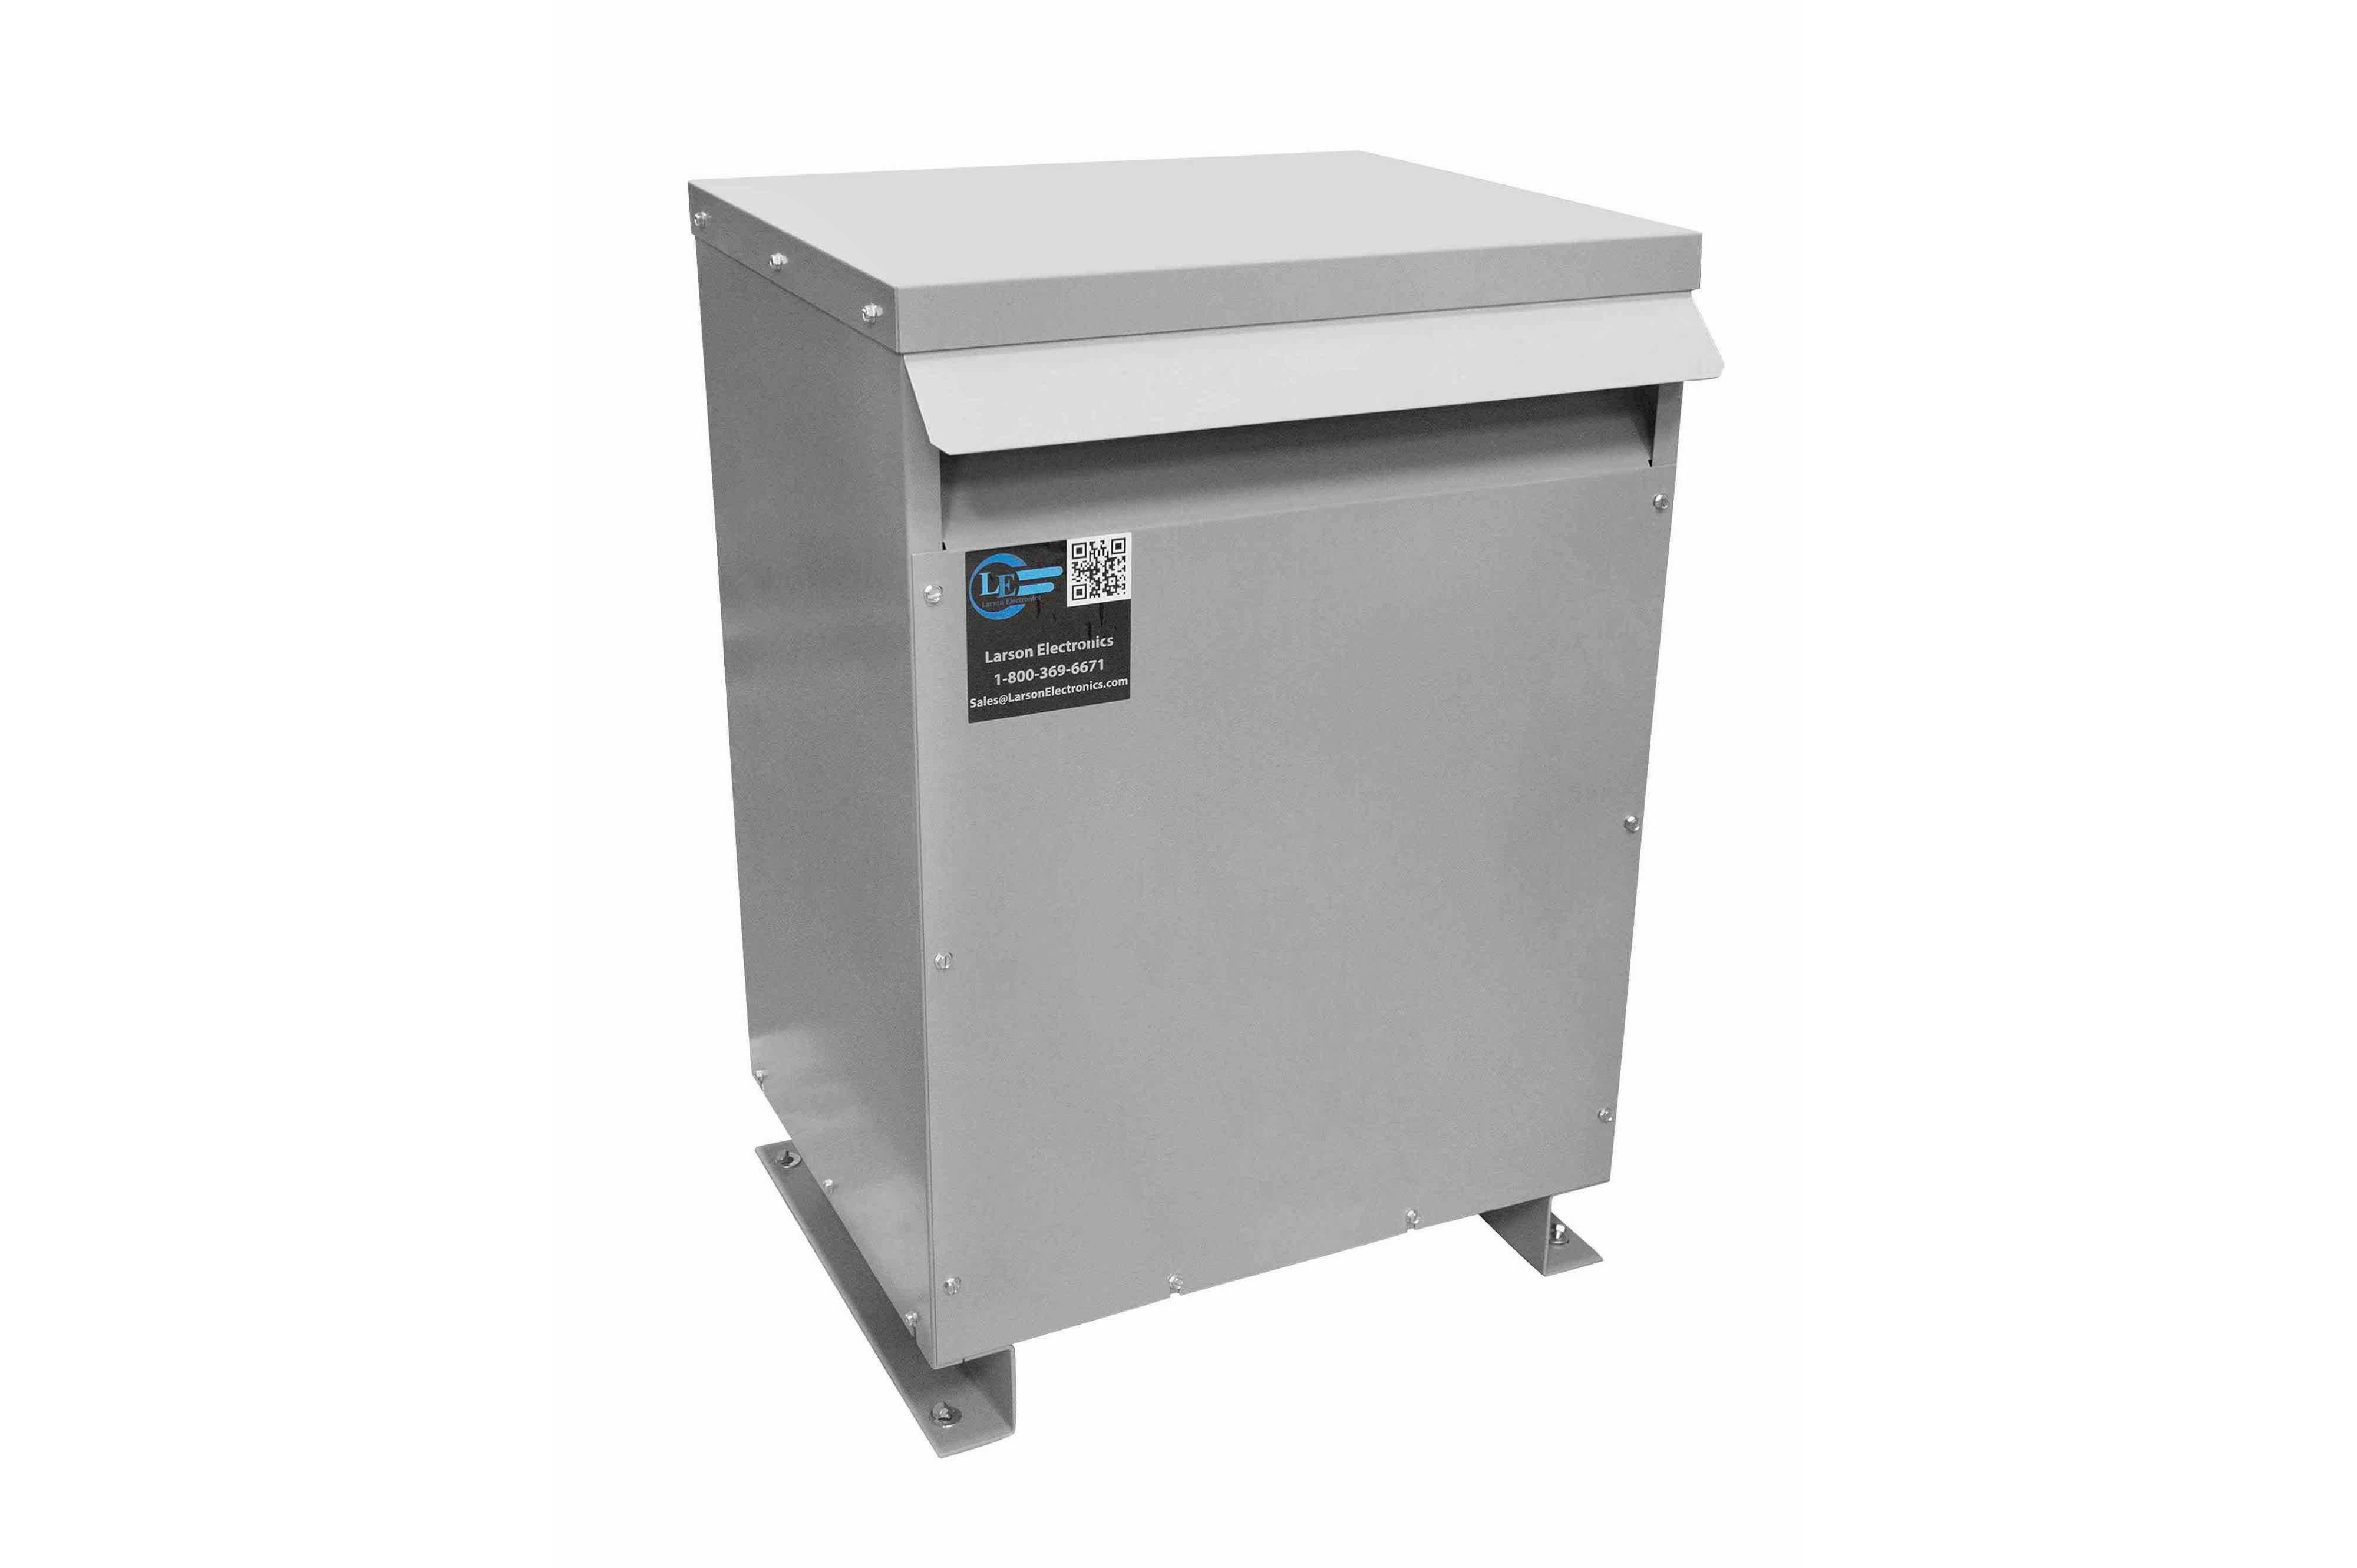 237.5 kVA 3PH Isolation Transformer, 400V Wye Primary, 208Y/120 Wye-N Secondary, N3R, Ventilated, 60 Hz